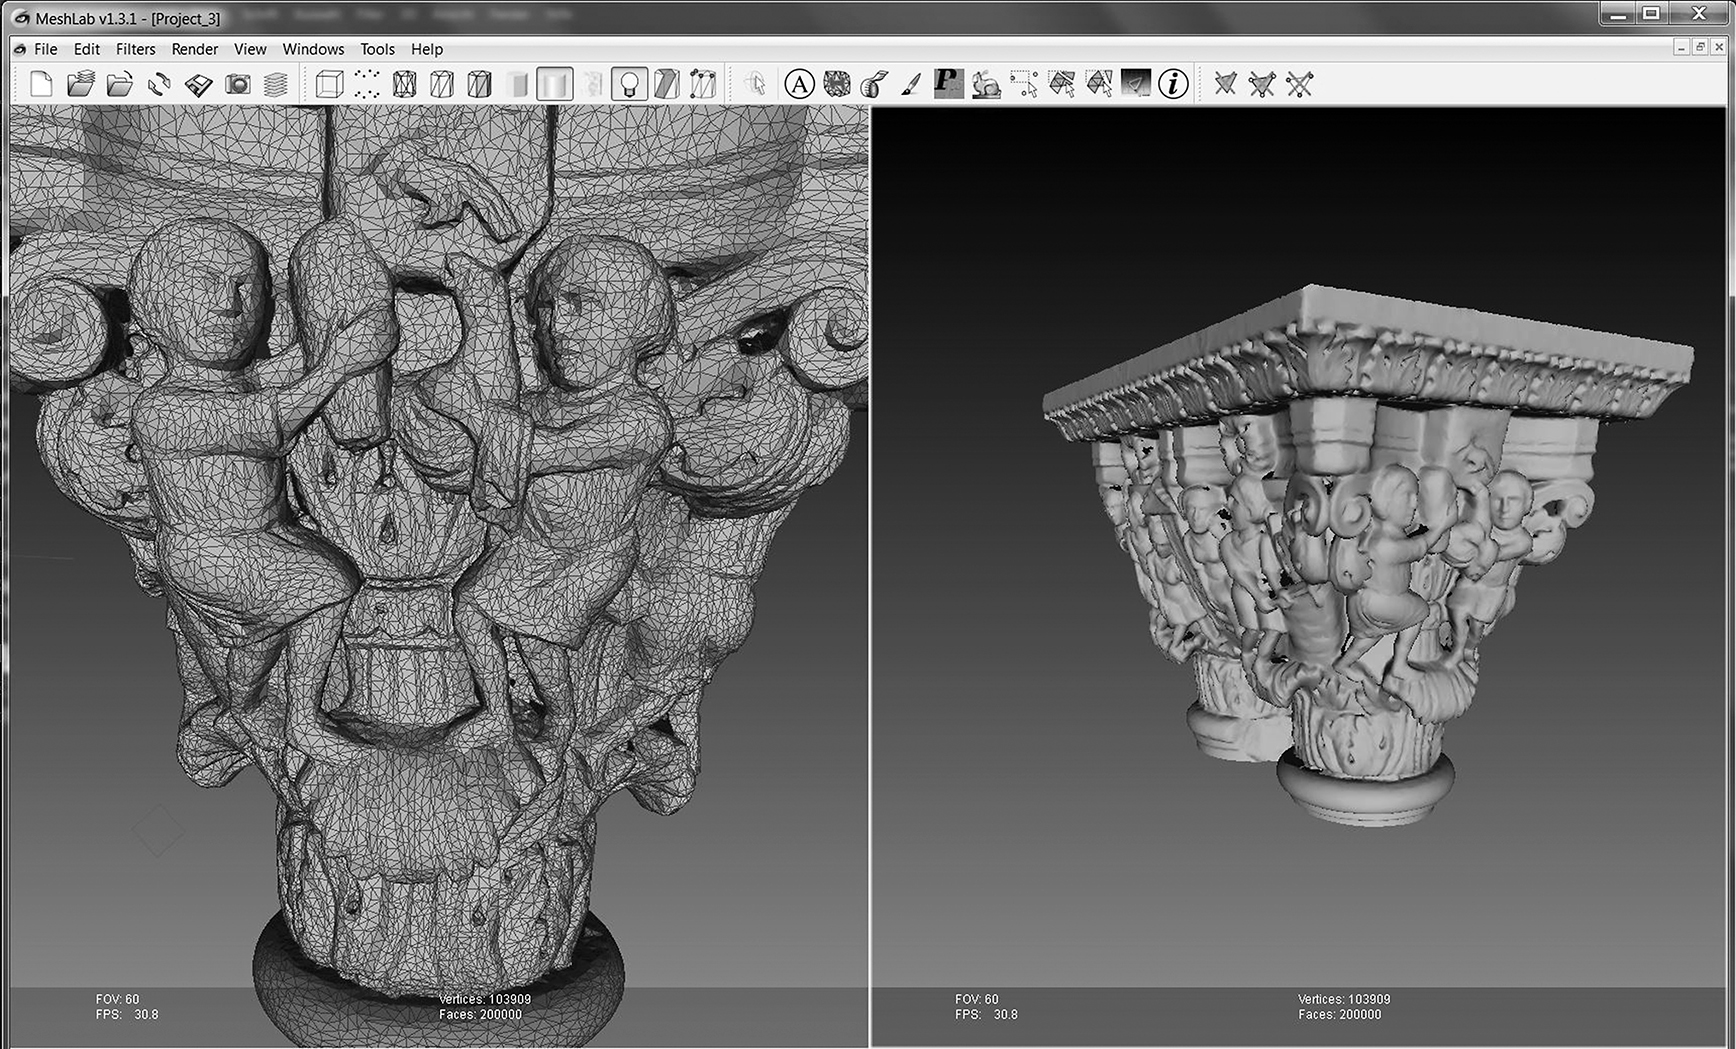 3D-Modell des Genesiskapitells aus dem Kreuzgang von Monreale, visualisiert mit der Software Meshlab (© KHI-MPI / ISTI-CNR)